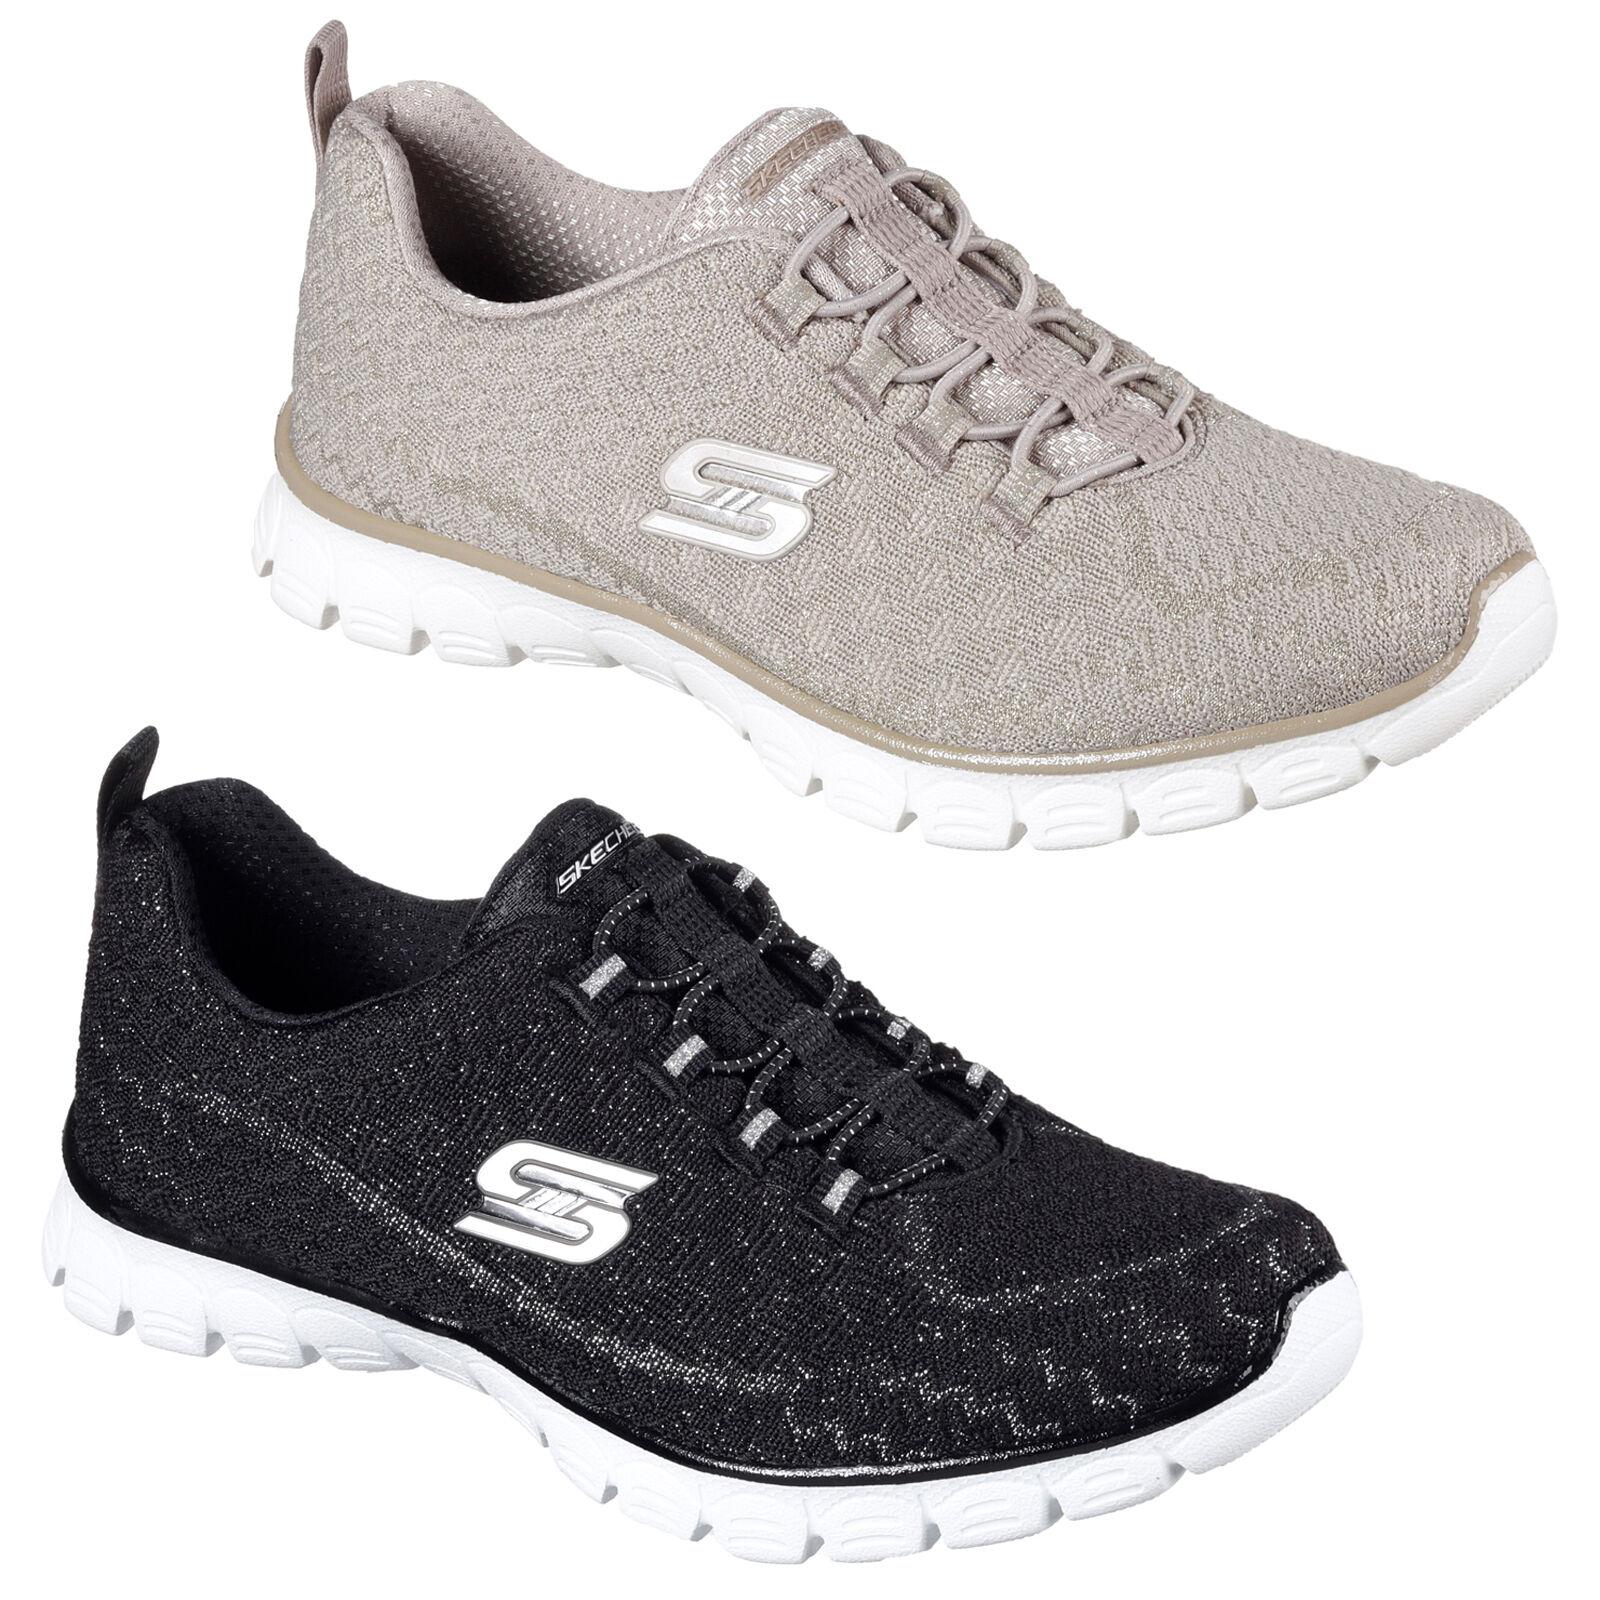 Skechers Stern Trainers EZ Flex 3.0 Sport elastisch Memory Foam Foam Foam Damen Schuhe 2505c8